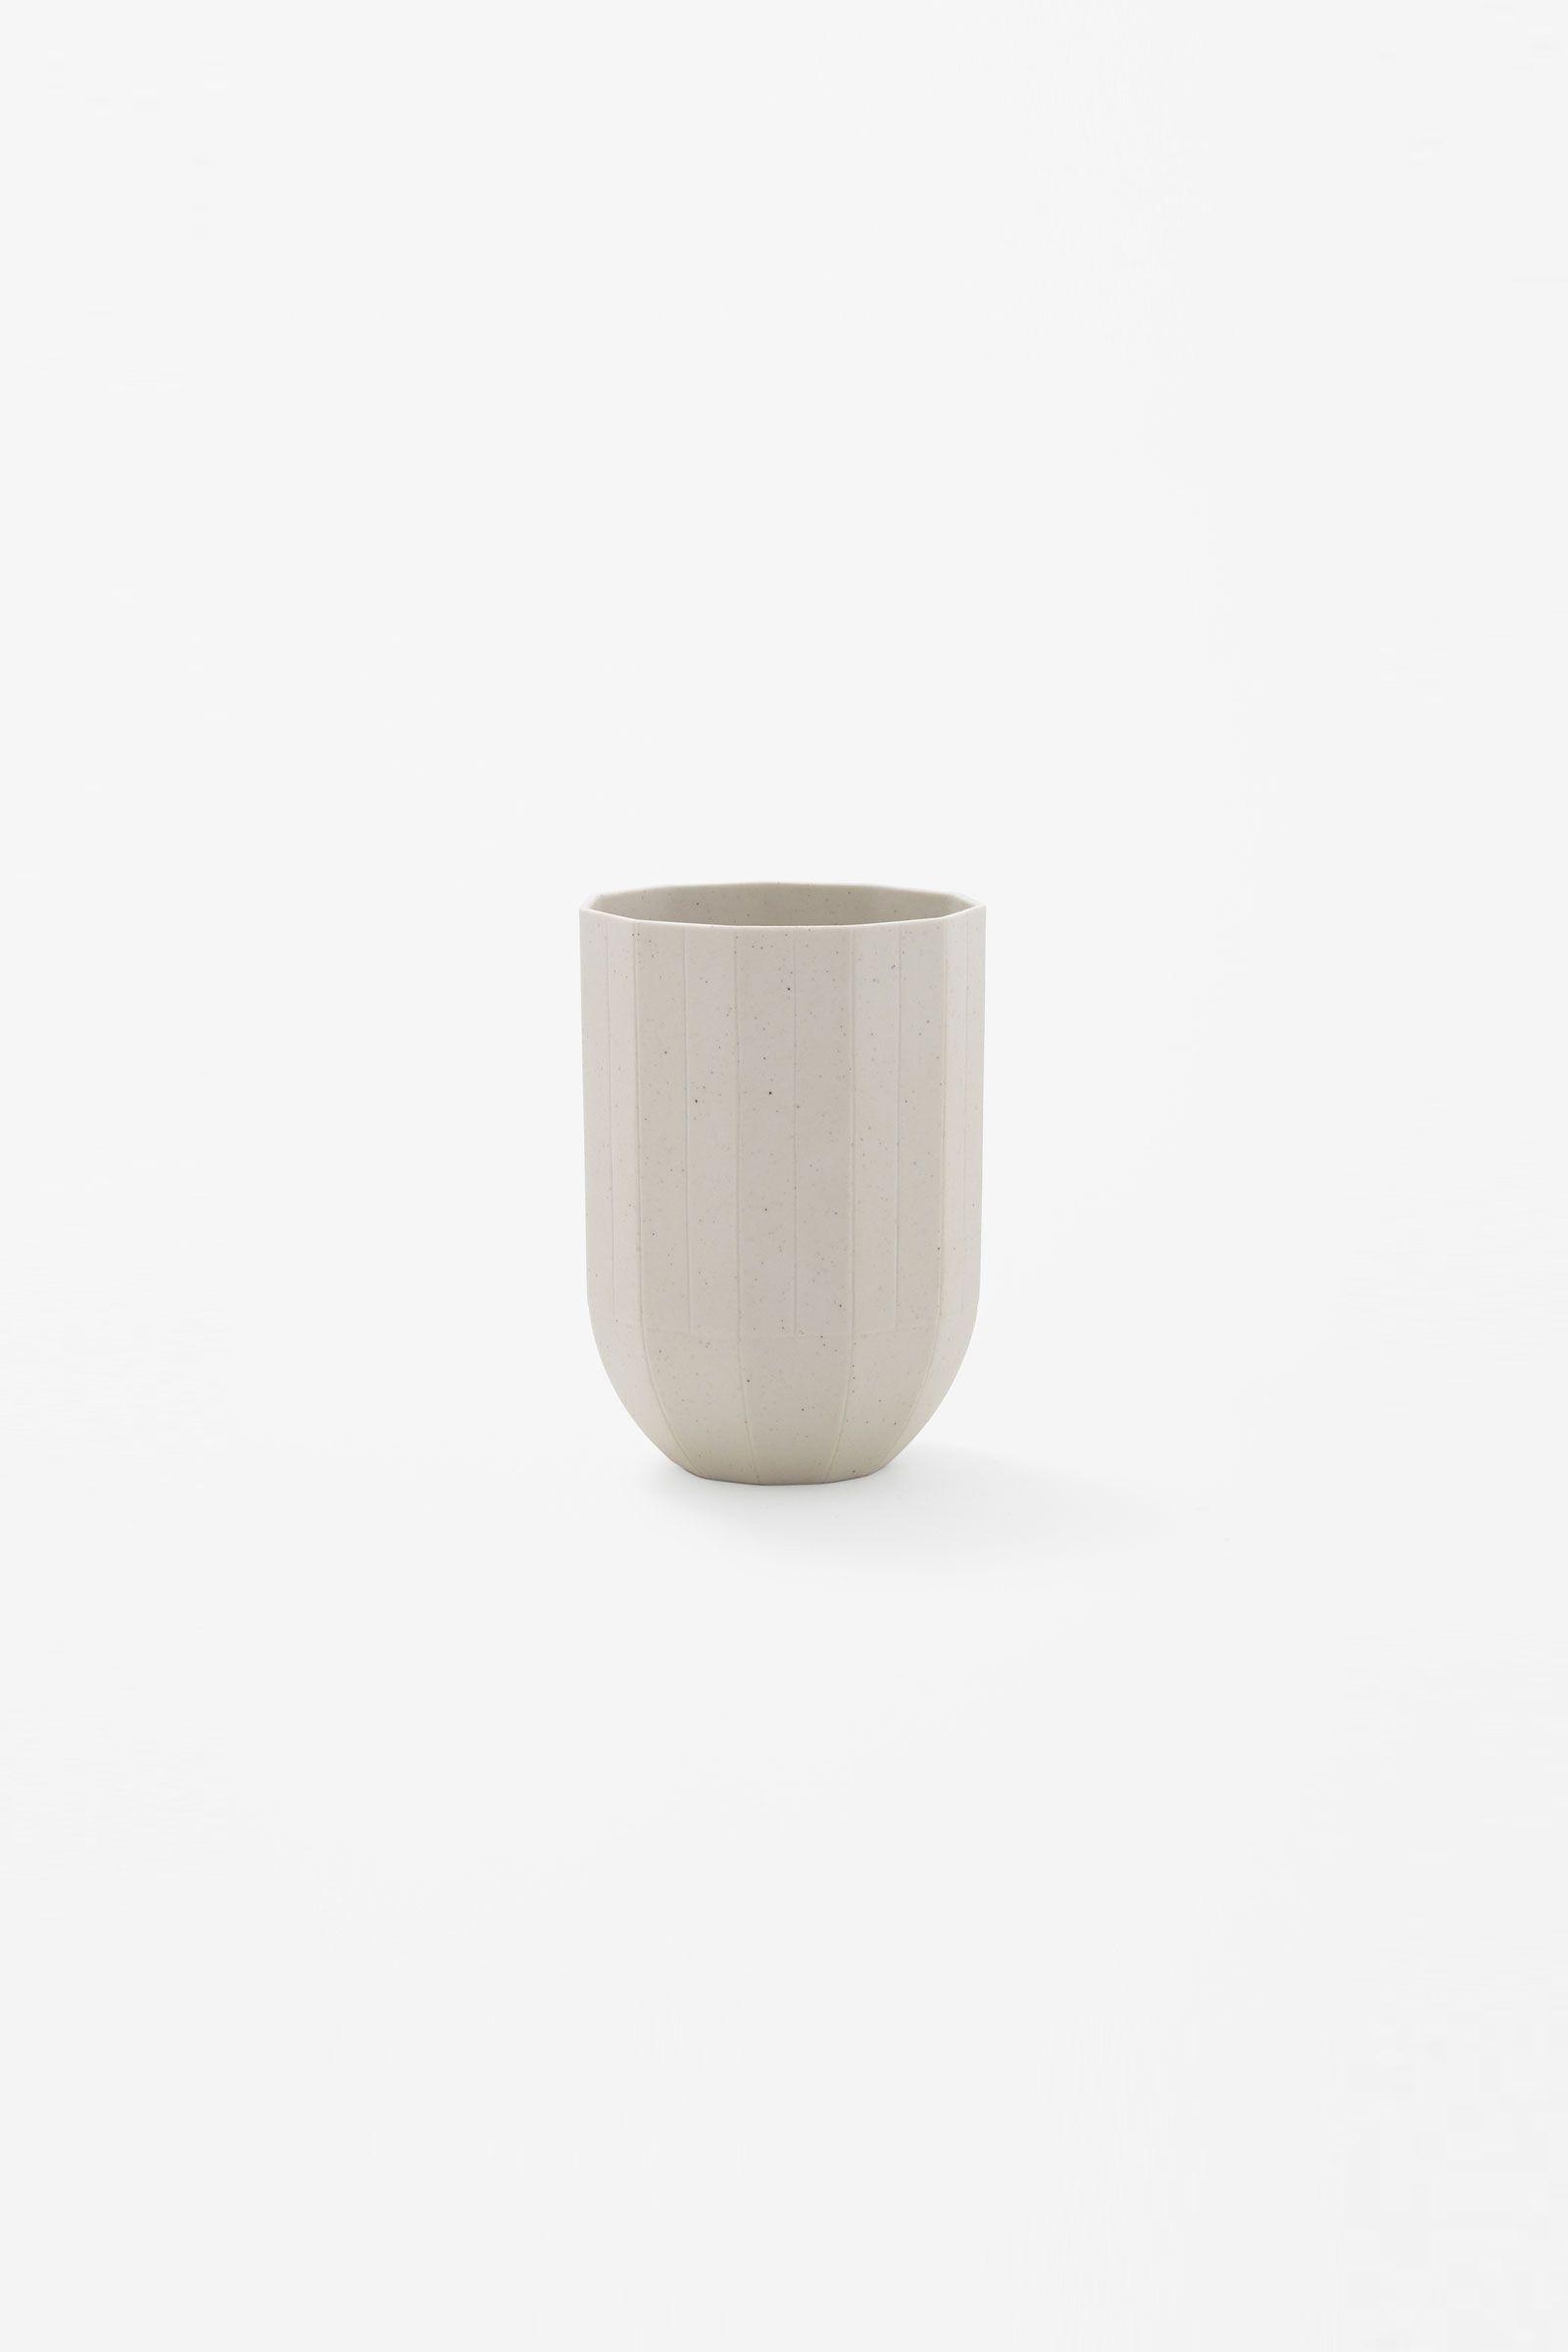 COS x HAY | Paper mug